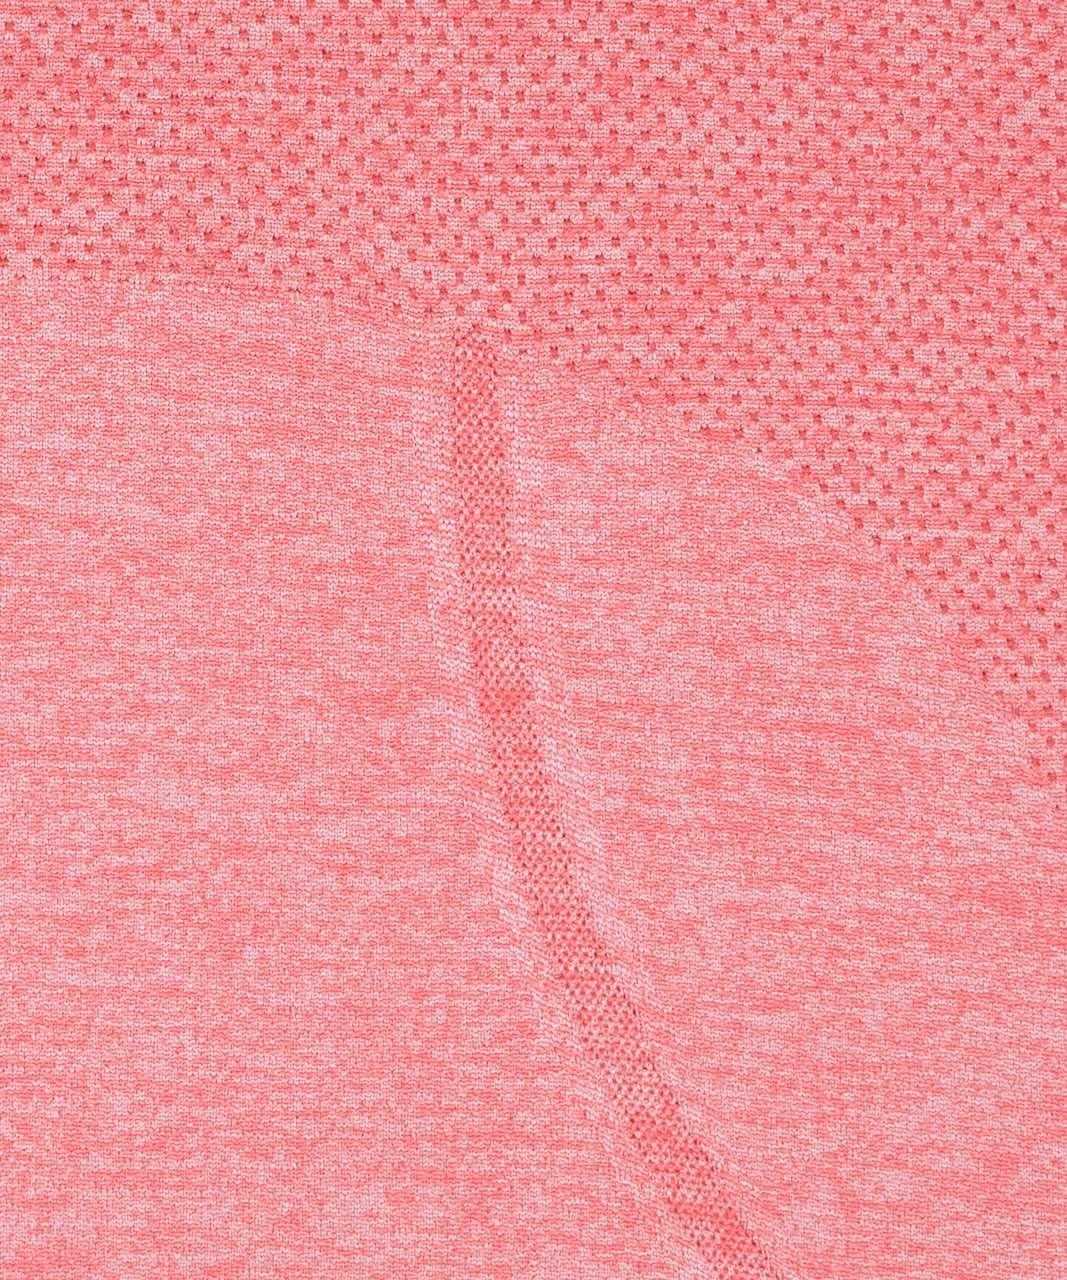 Lululemon Swiftly Tech Long Sleeve Crew - Blush Coral / Faint Coral